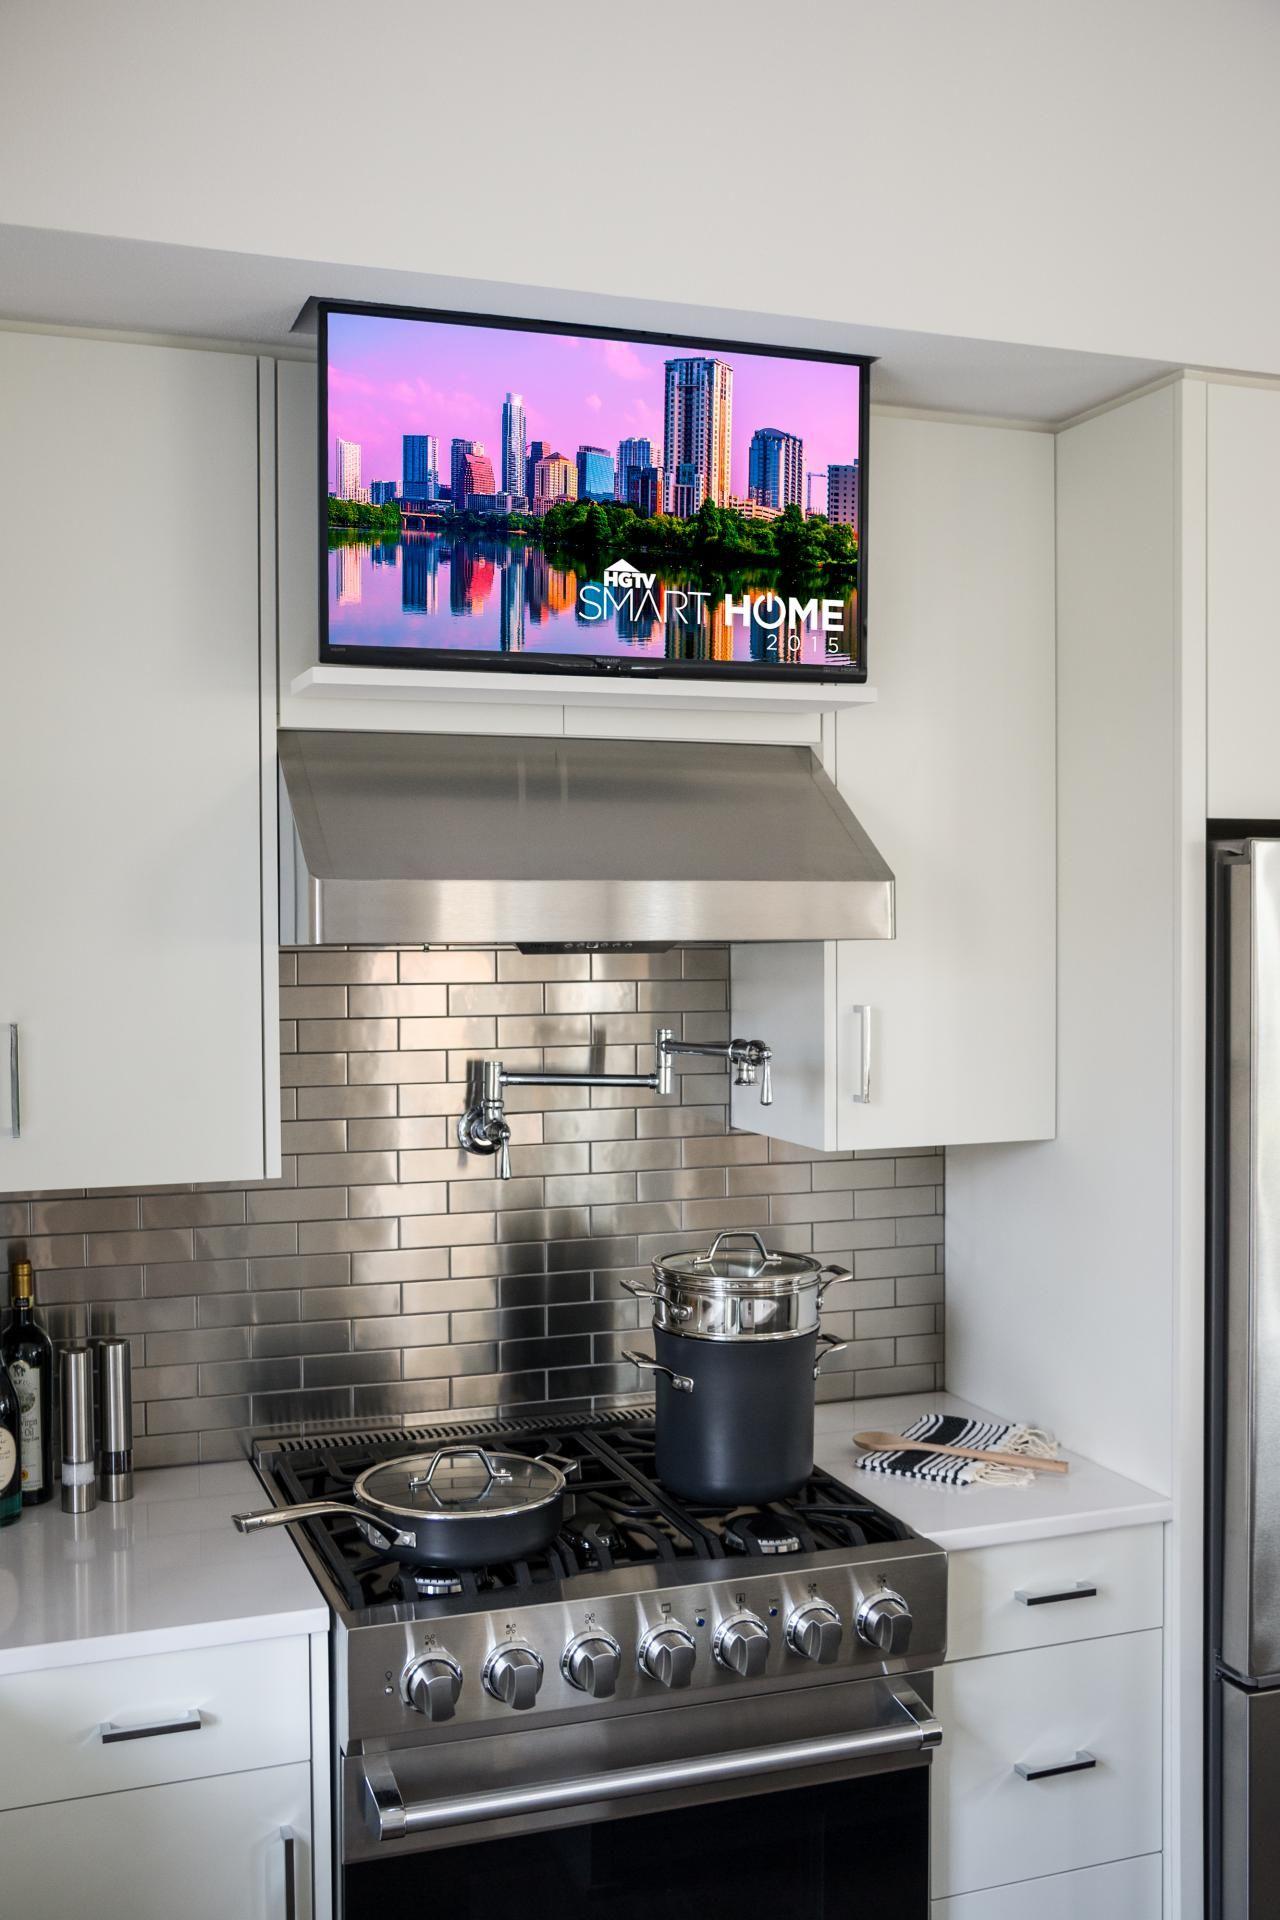 Smart Tv Kitchen Restaurant Door Hinges Features From Hgtv Home 2015 Nads Homestyle